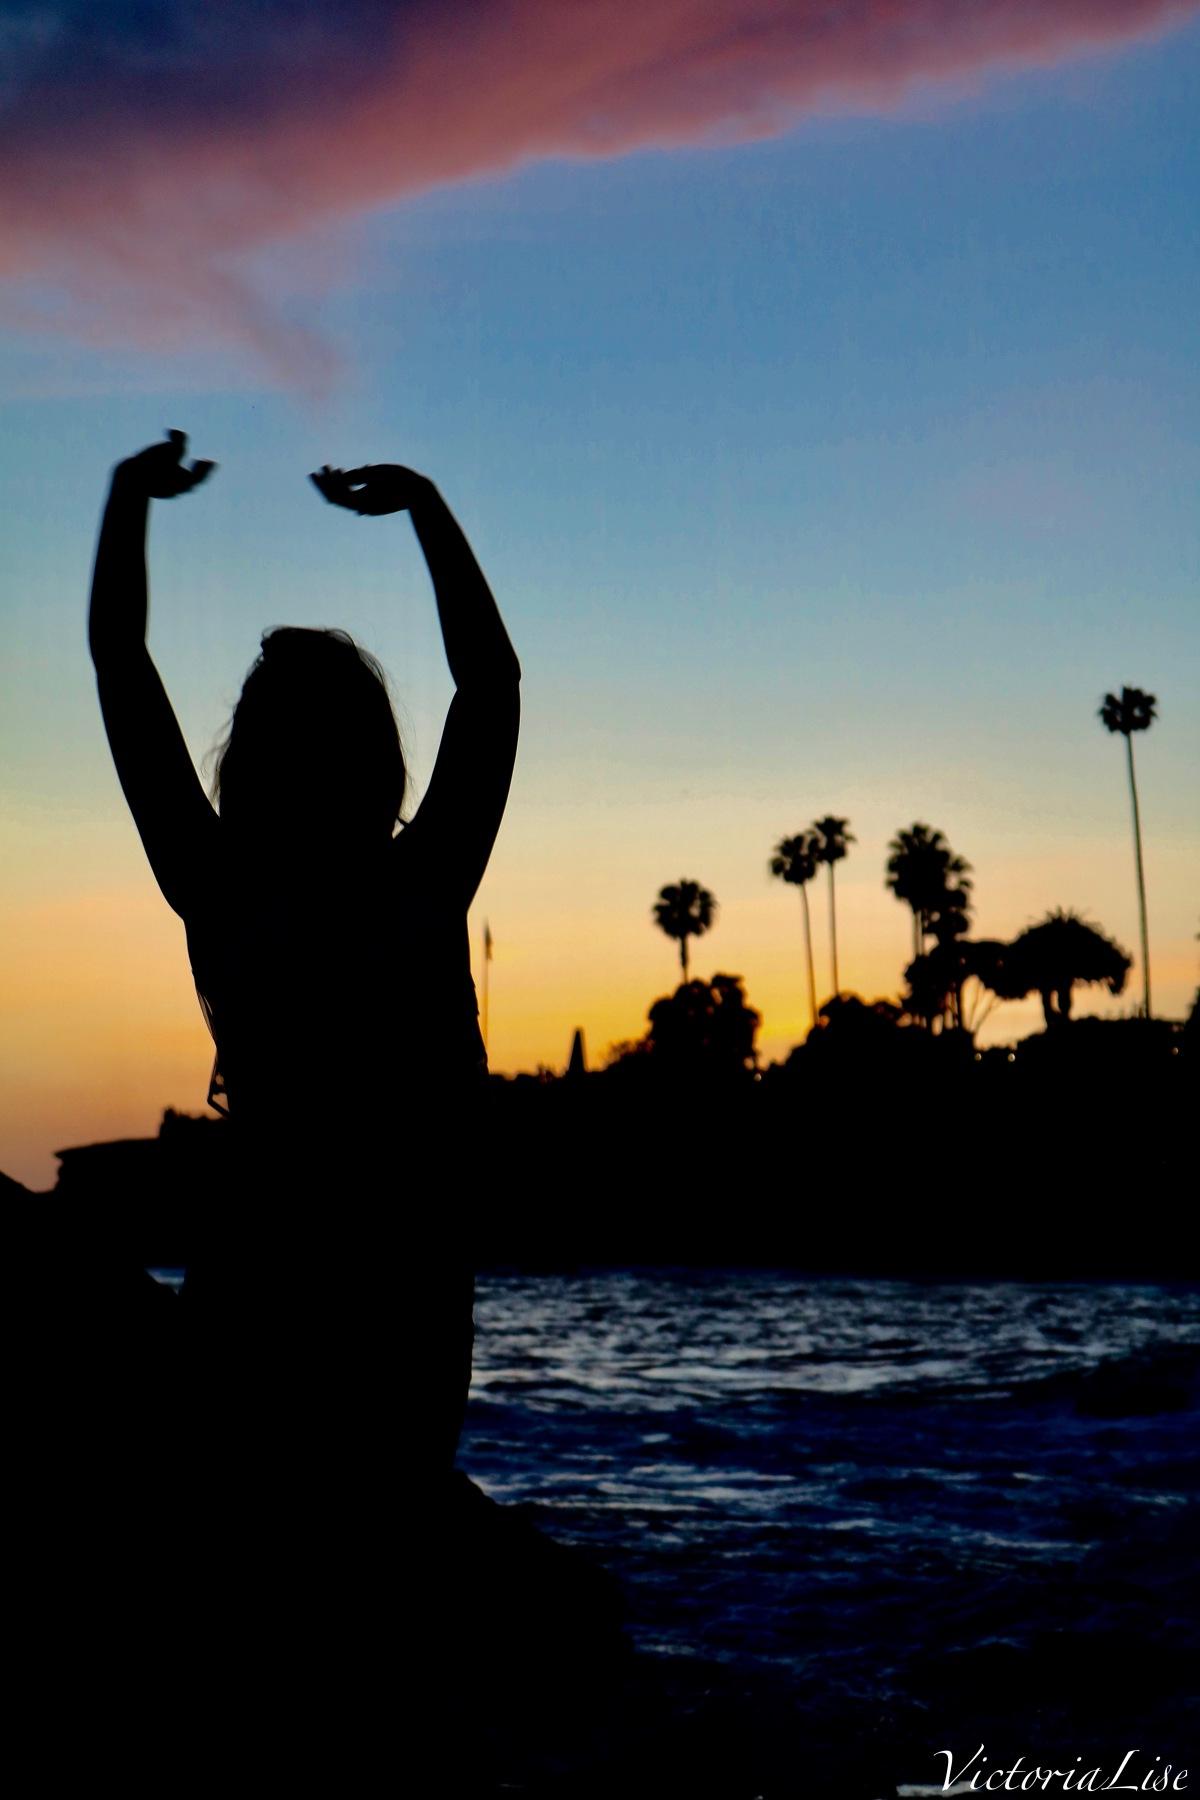 Victoria Lise Looks at Laguna Beach Sunset